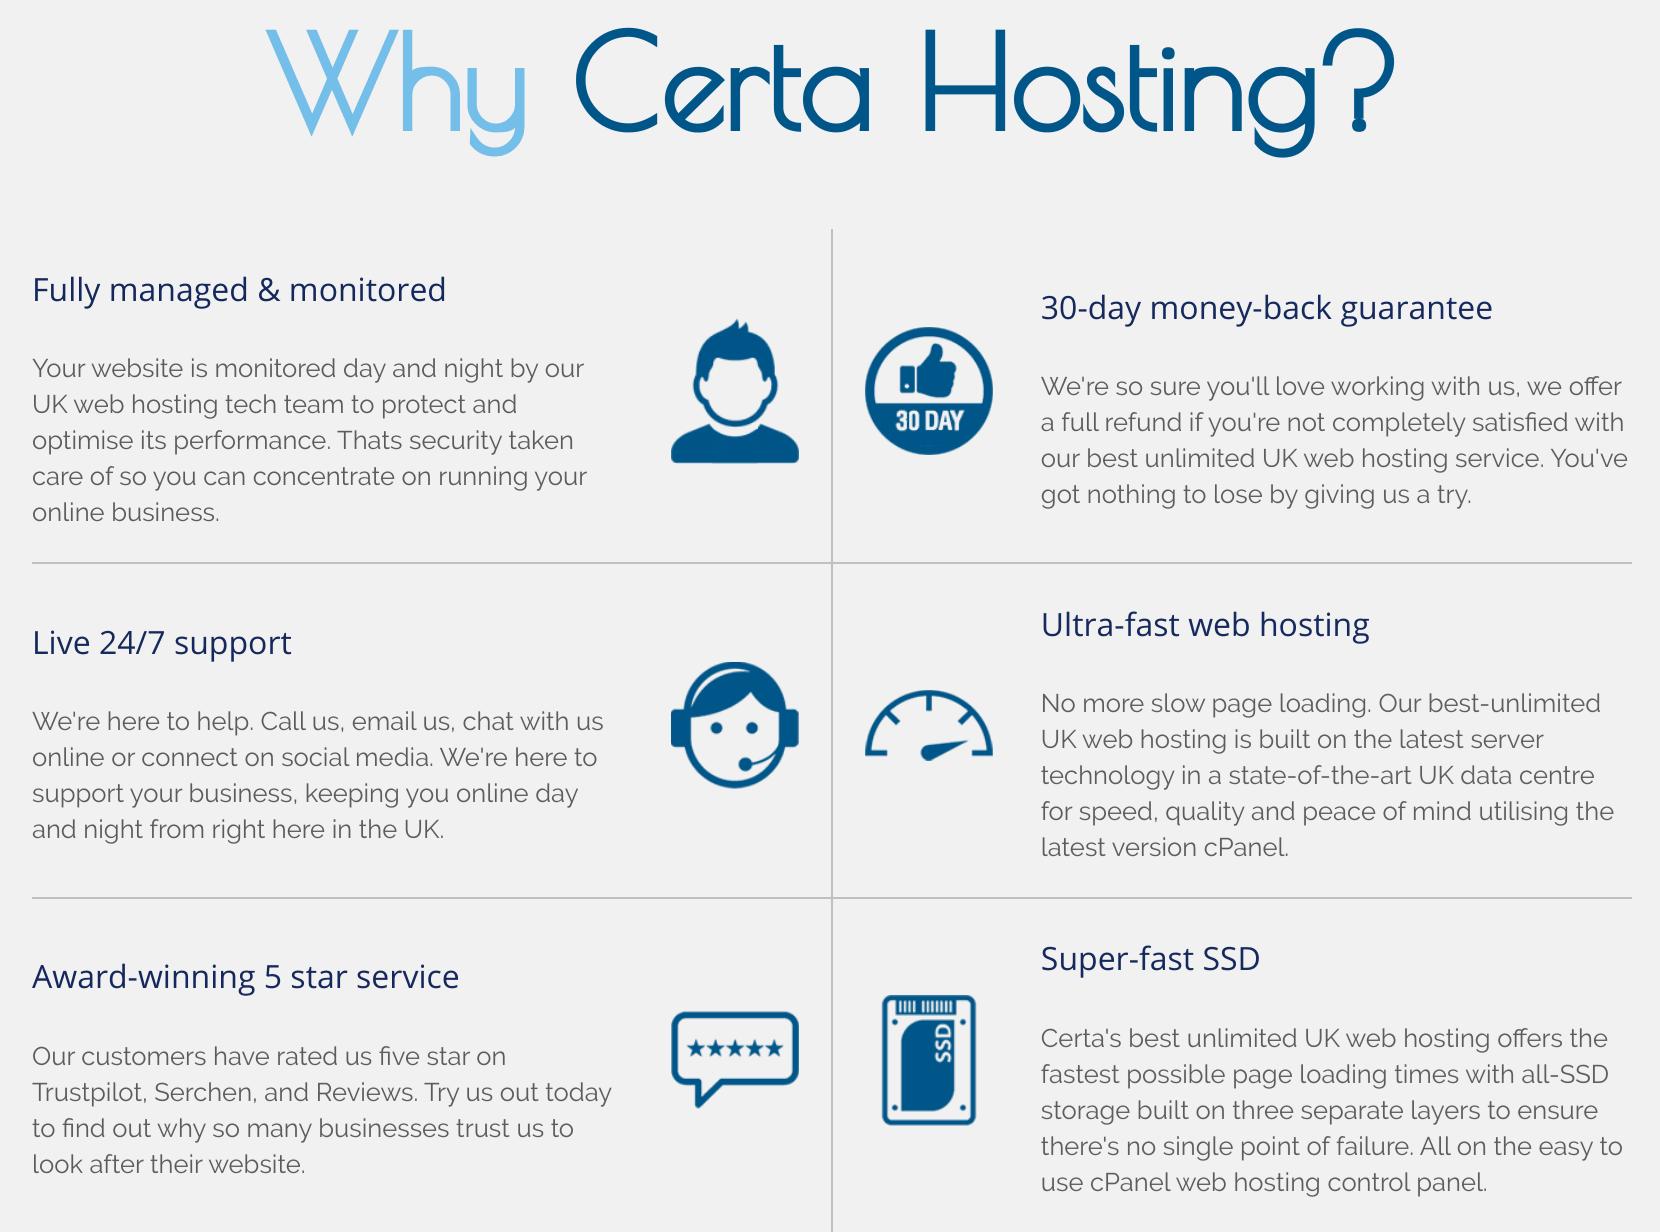 Certa Hosting